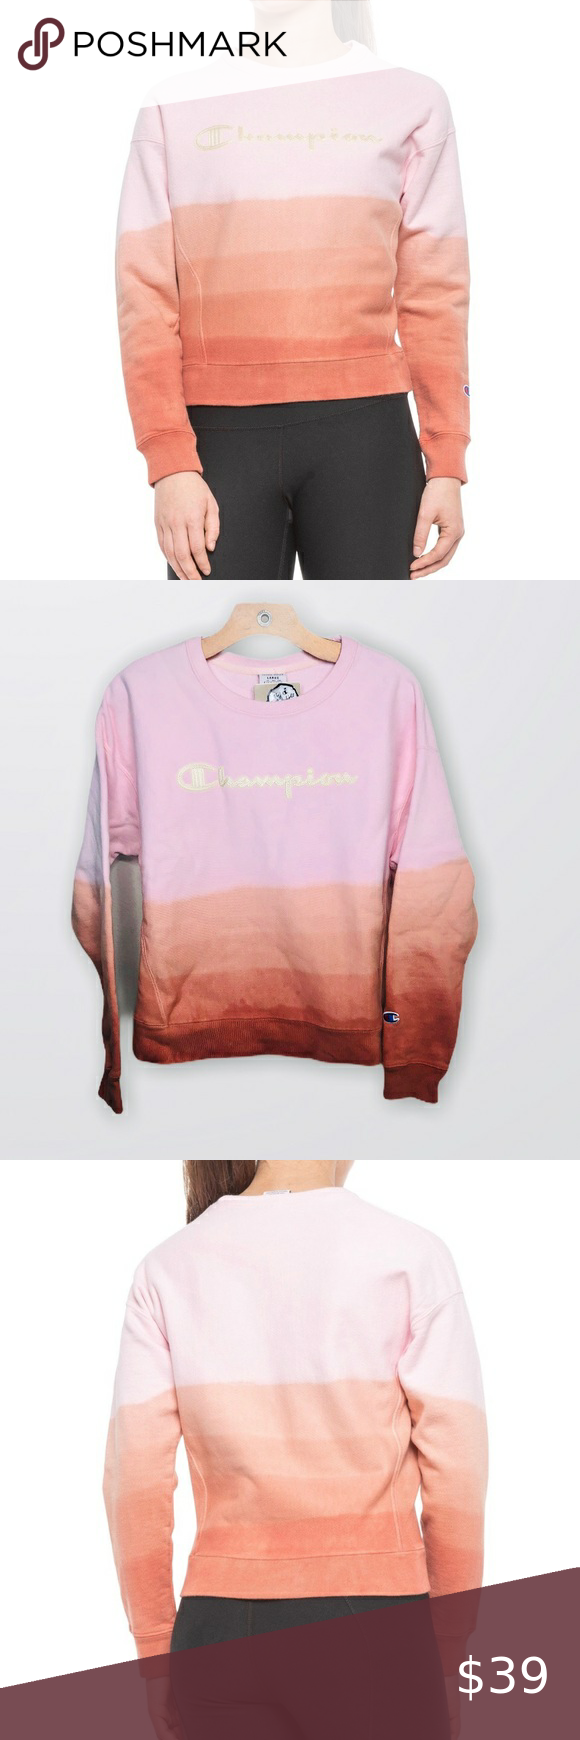 Champion Pink Ombre Sweatshirt Crew Neck Small Nwt Ombre Sweatshirt Pink Ombre Pink And Orange [ 1740 x 580 Pixel ]